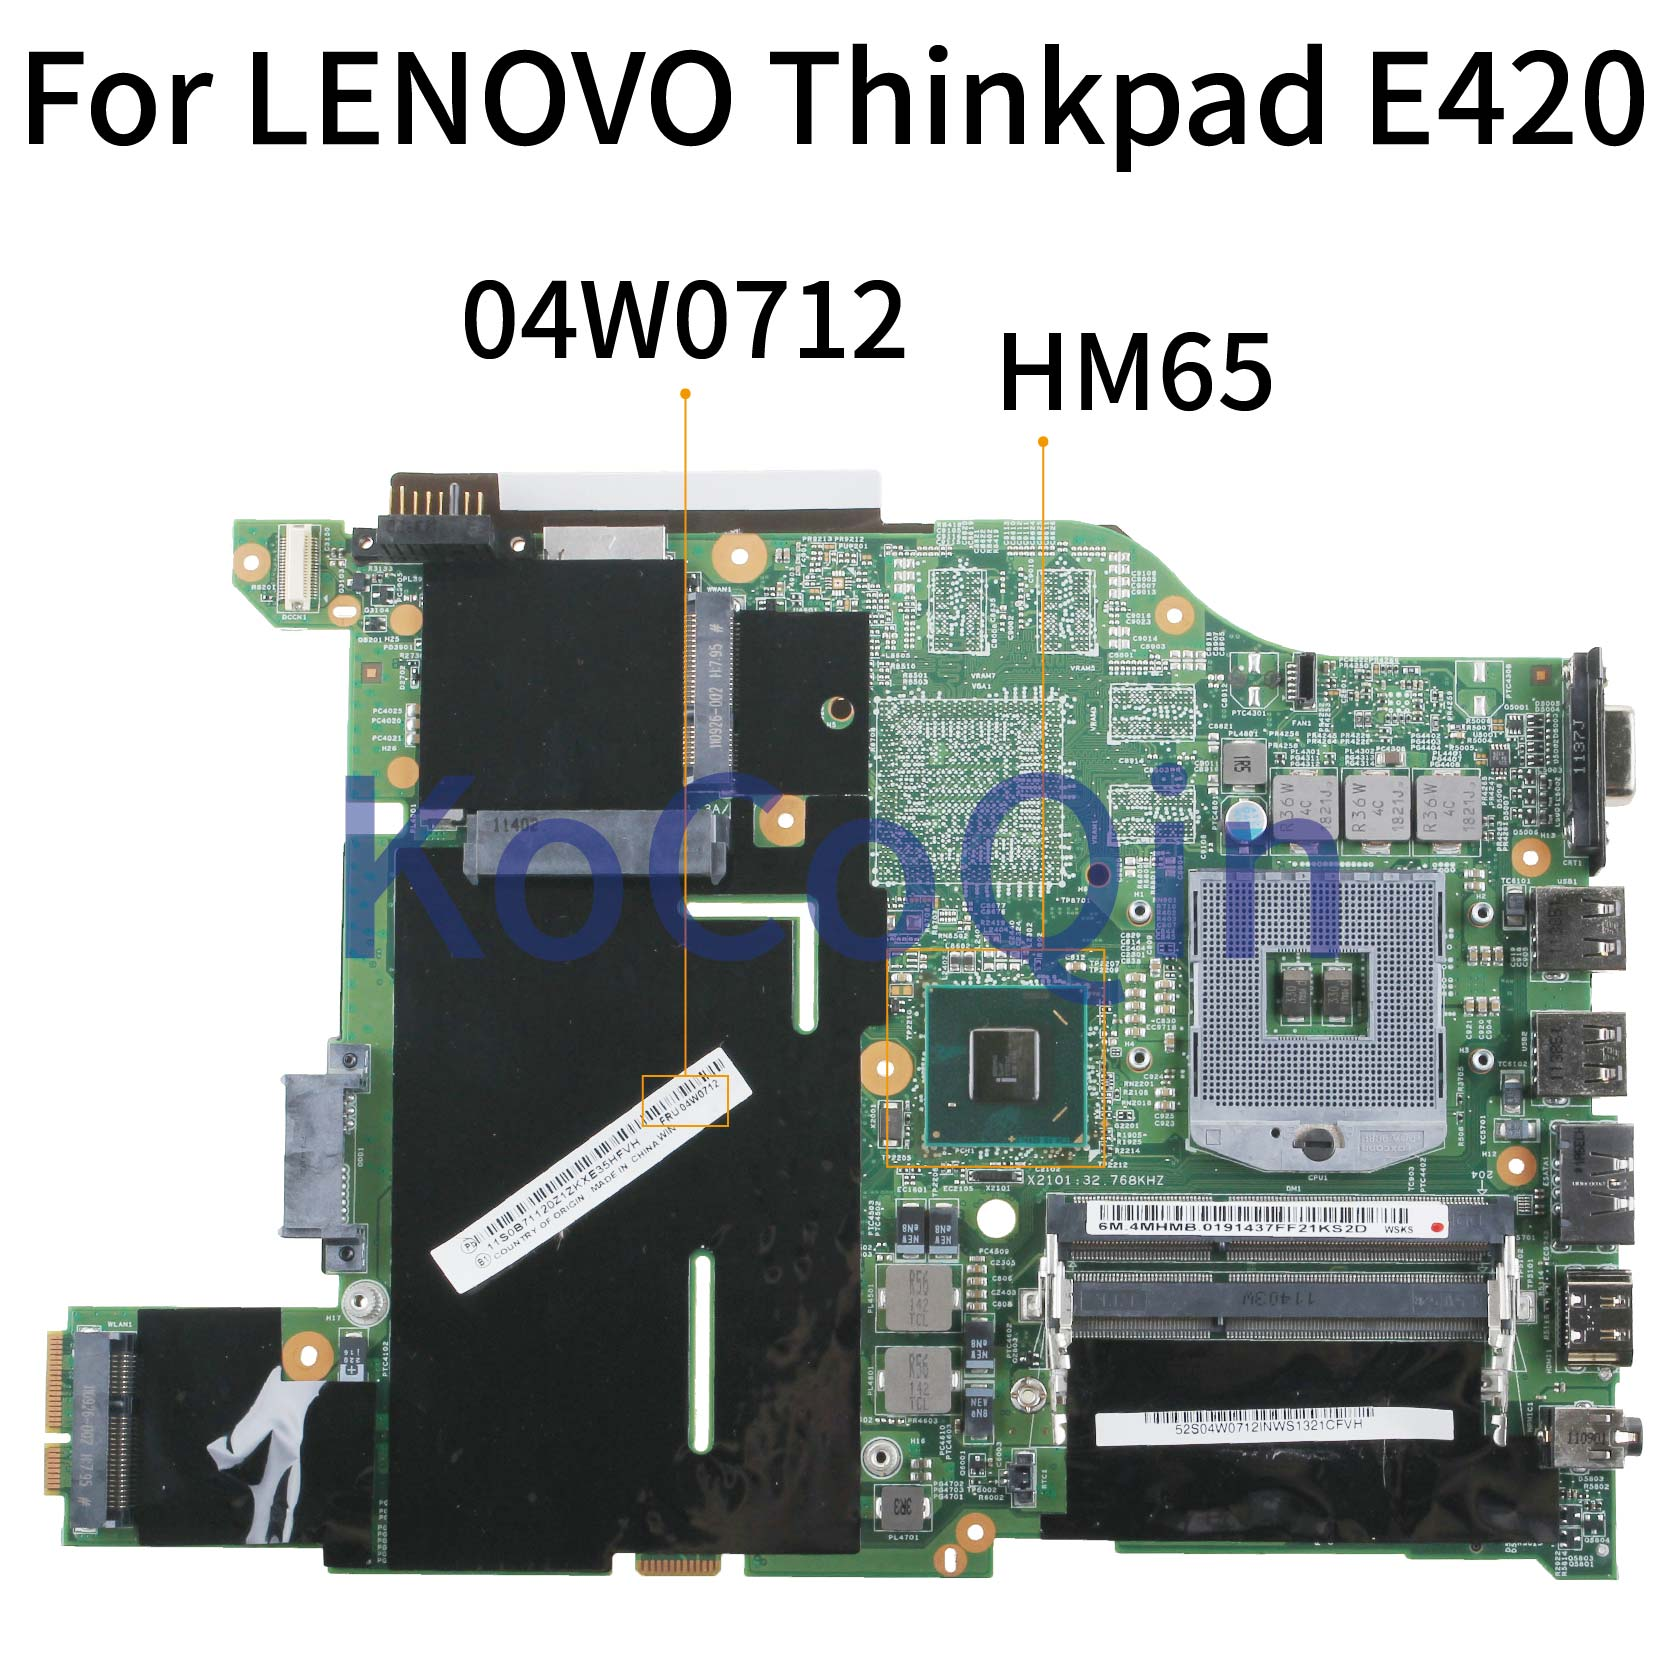 KoCoQin Laptop Motherboard For IBM Edge 420 E420 HM65 Mainboard 04W0712 04W0728 04W0610 04W0394 04W2089